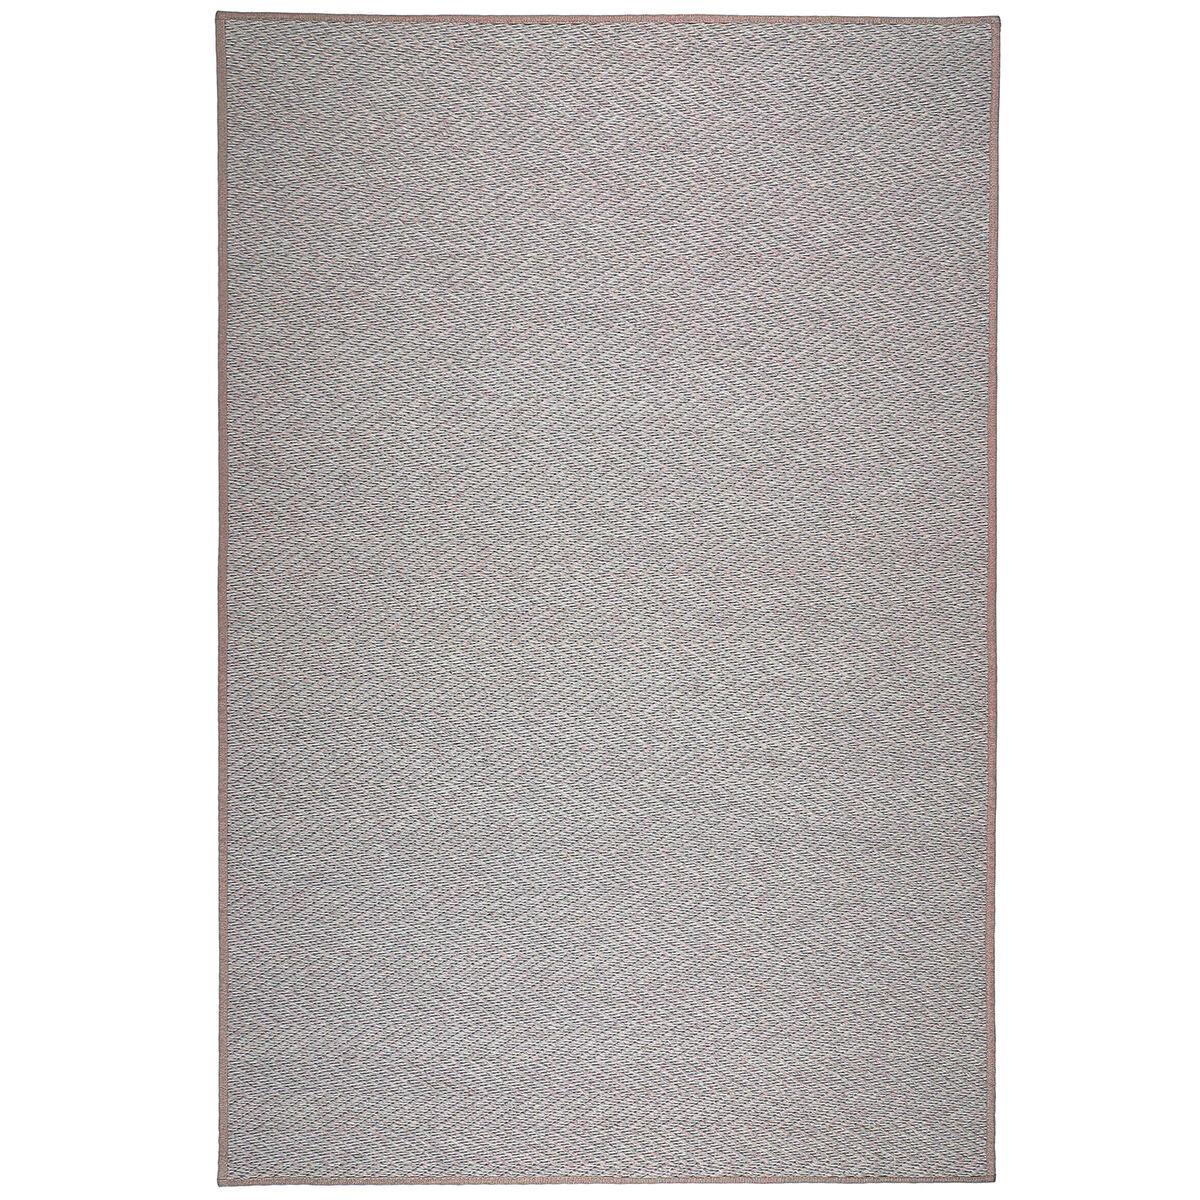 VM Carpet Elsa matto, harmaa